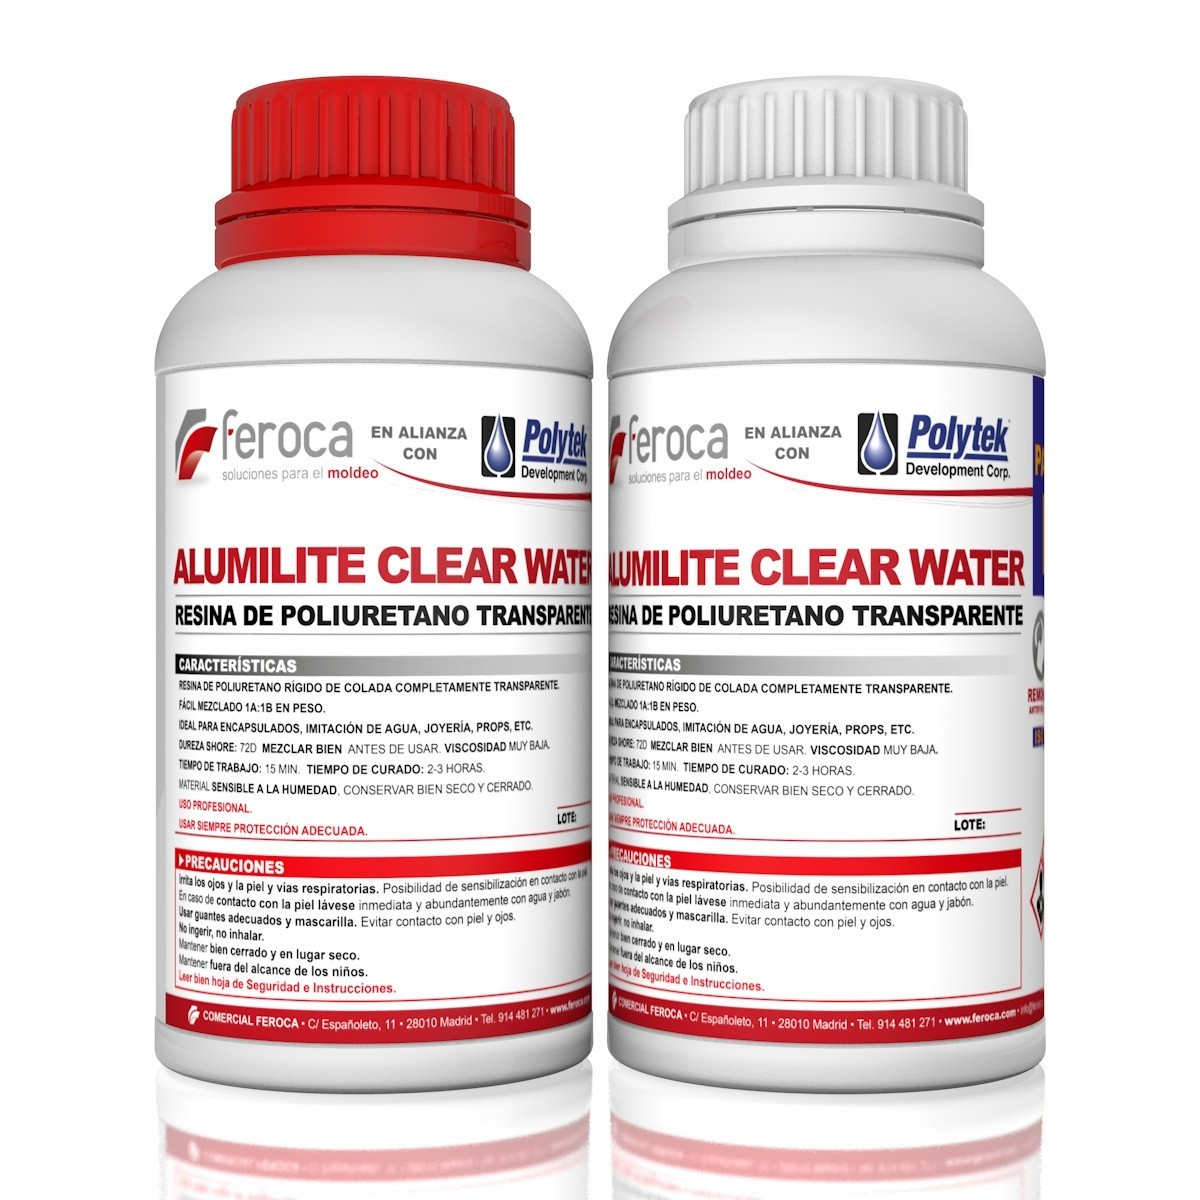 Alumilite Clear